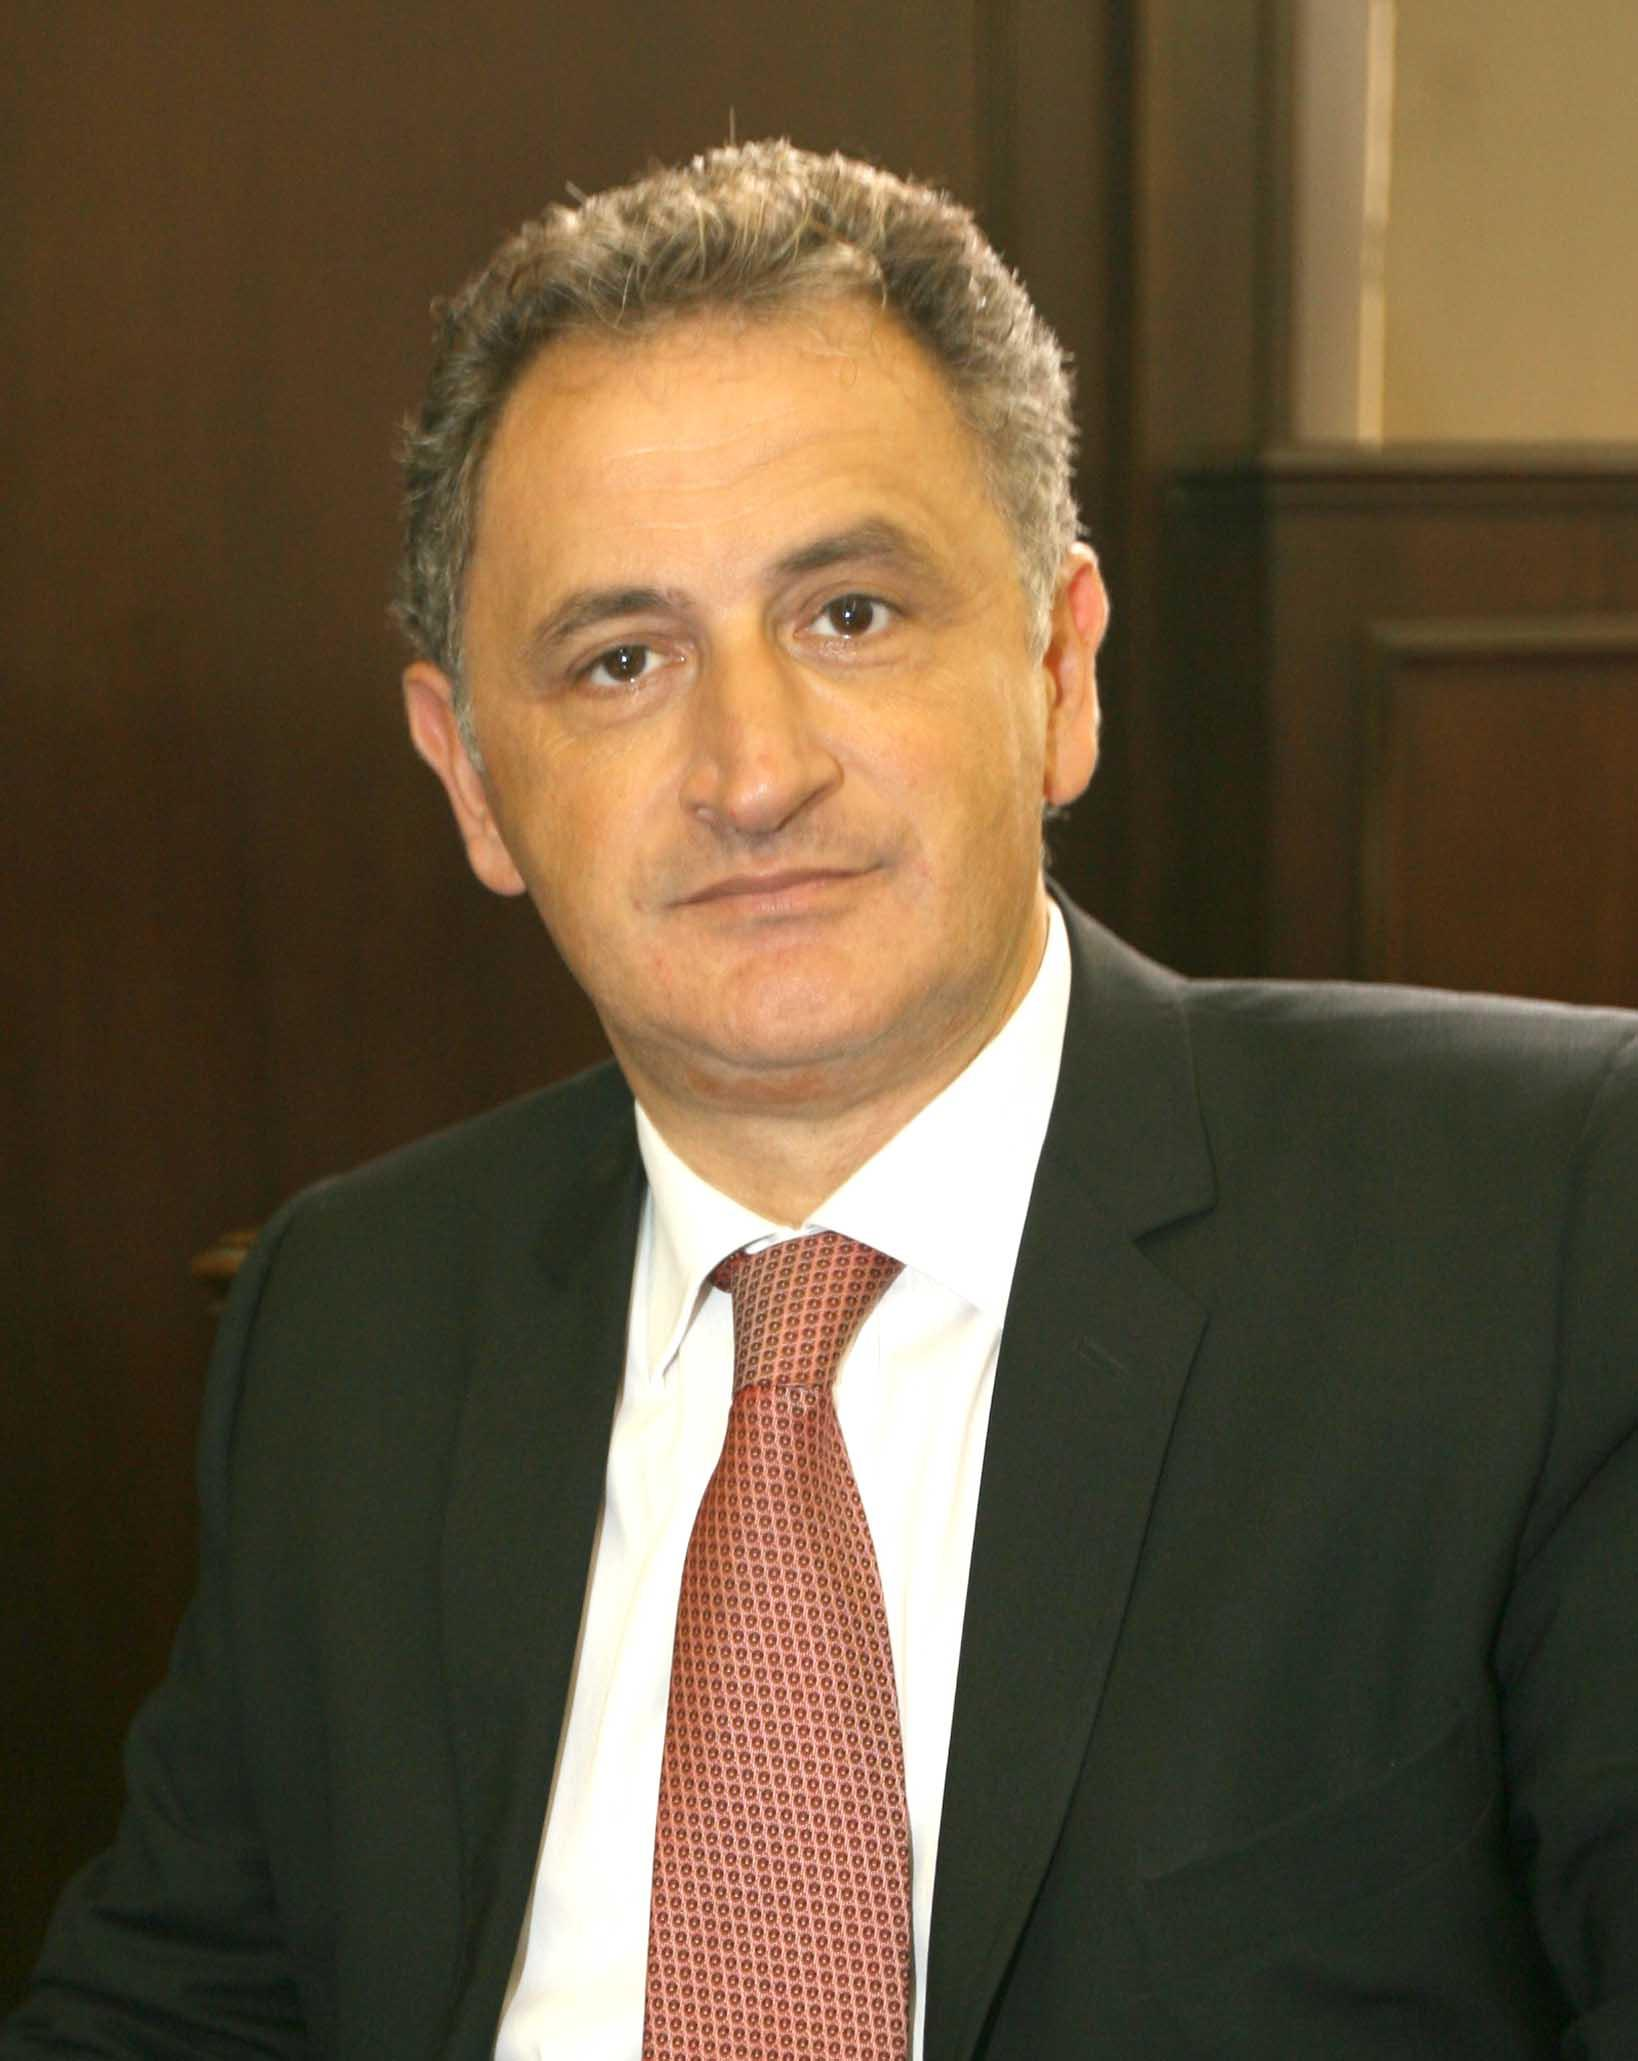 Giuseppe Ferrandino - Sindaco Napoli